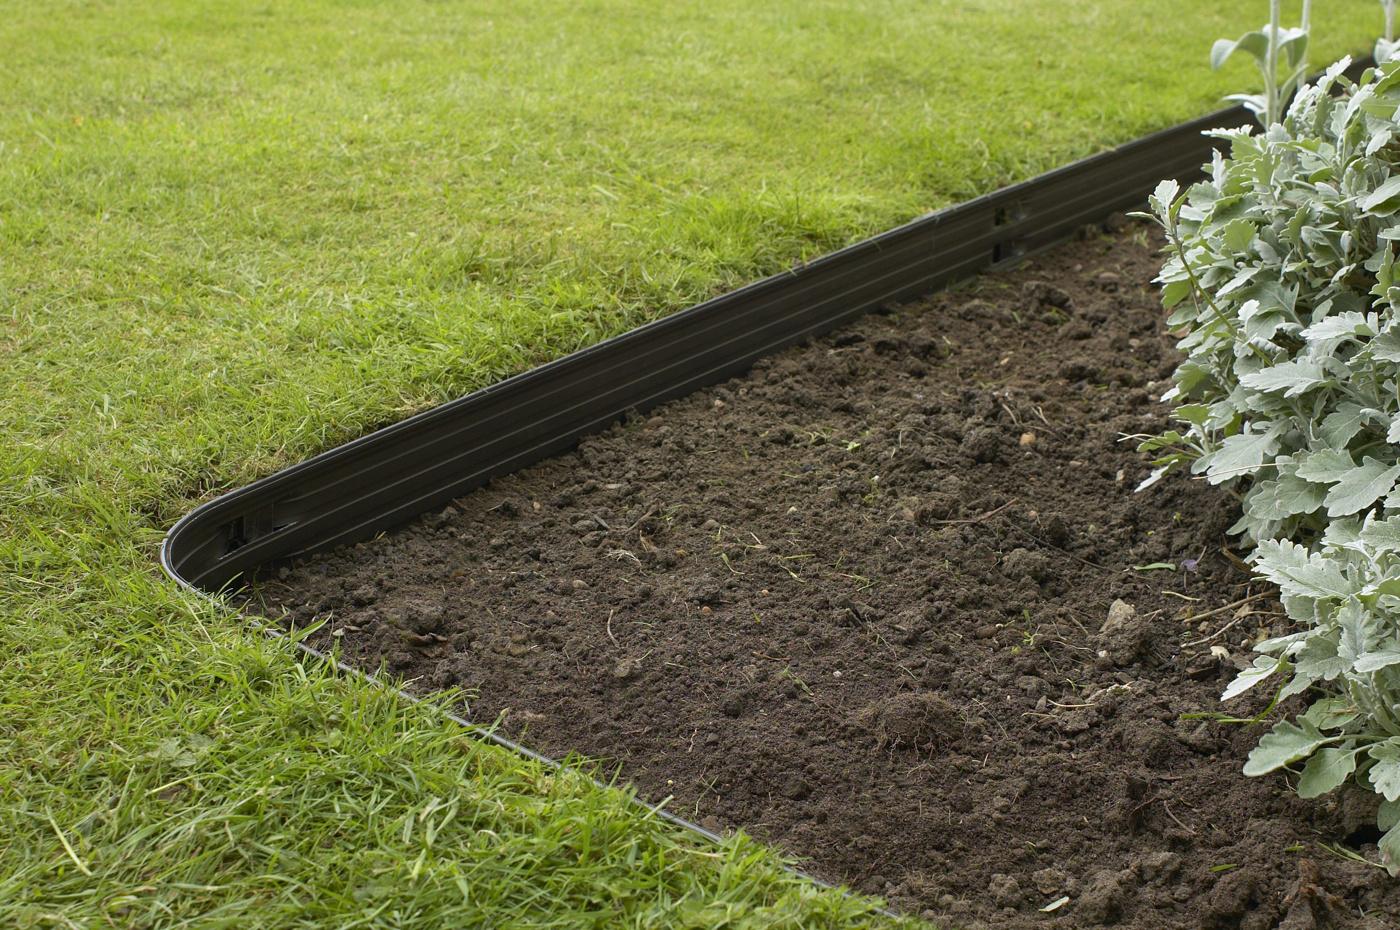 Rite-Edge gräskantavskiljare hörn i trädgård